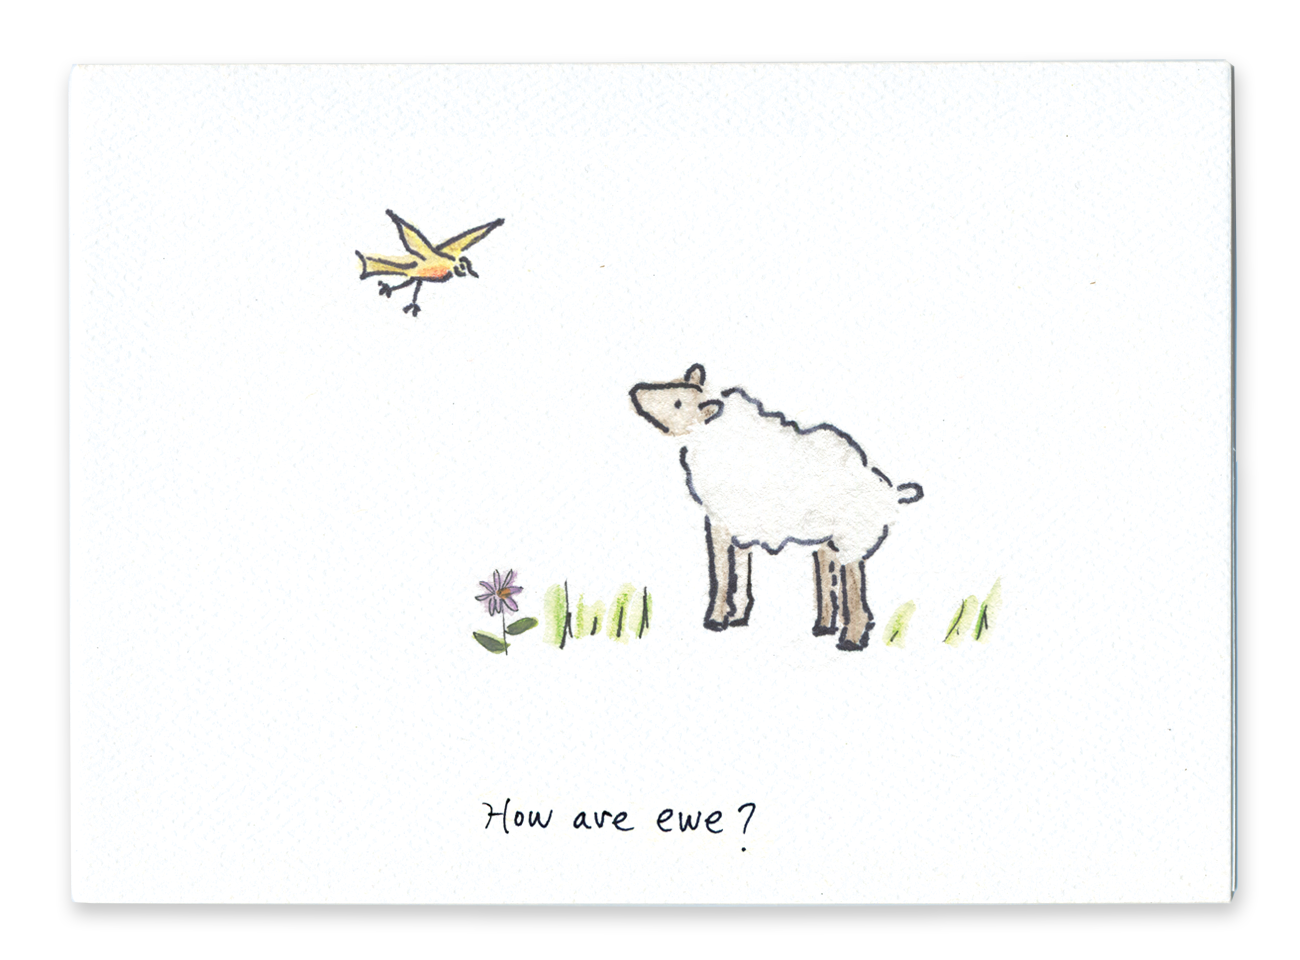 How Are Ewe?